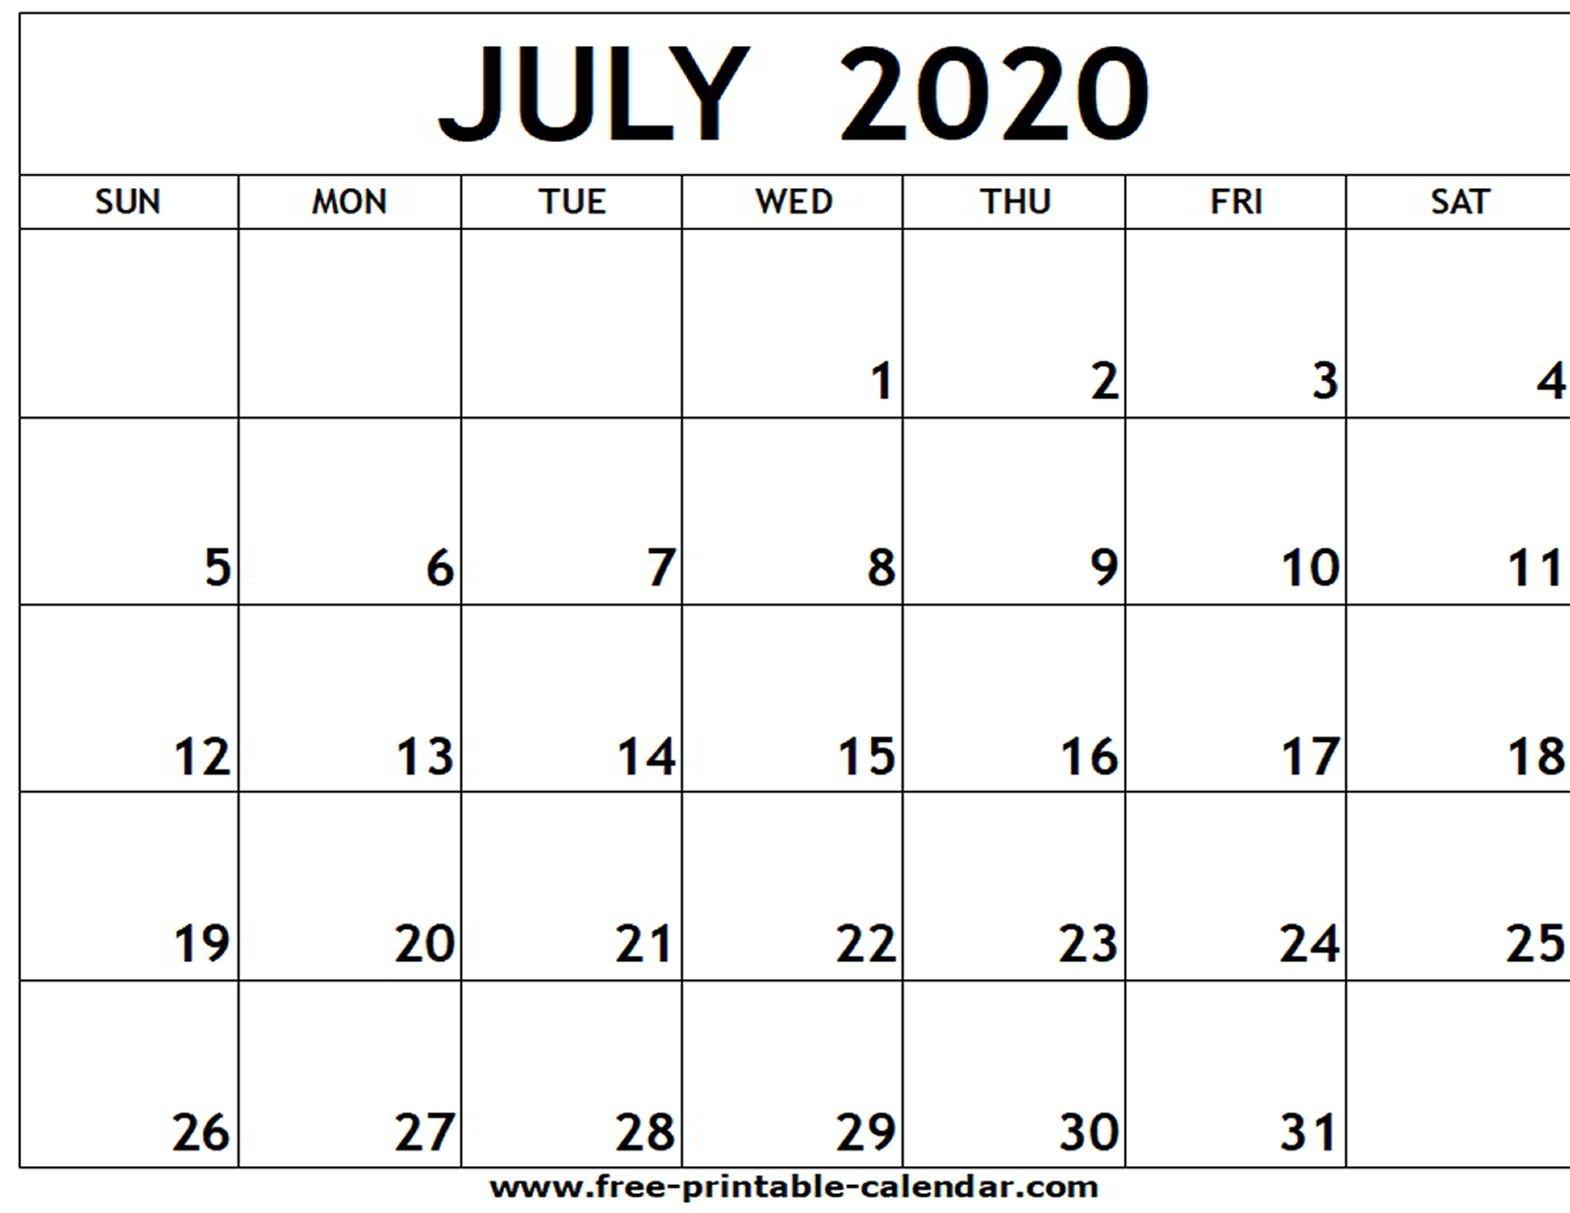 Calendar July 2020 - Wpa.wpart.co-Monthly Calendar June-July 2020